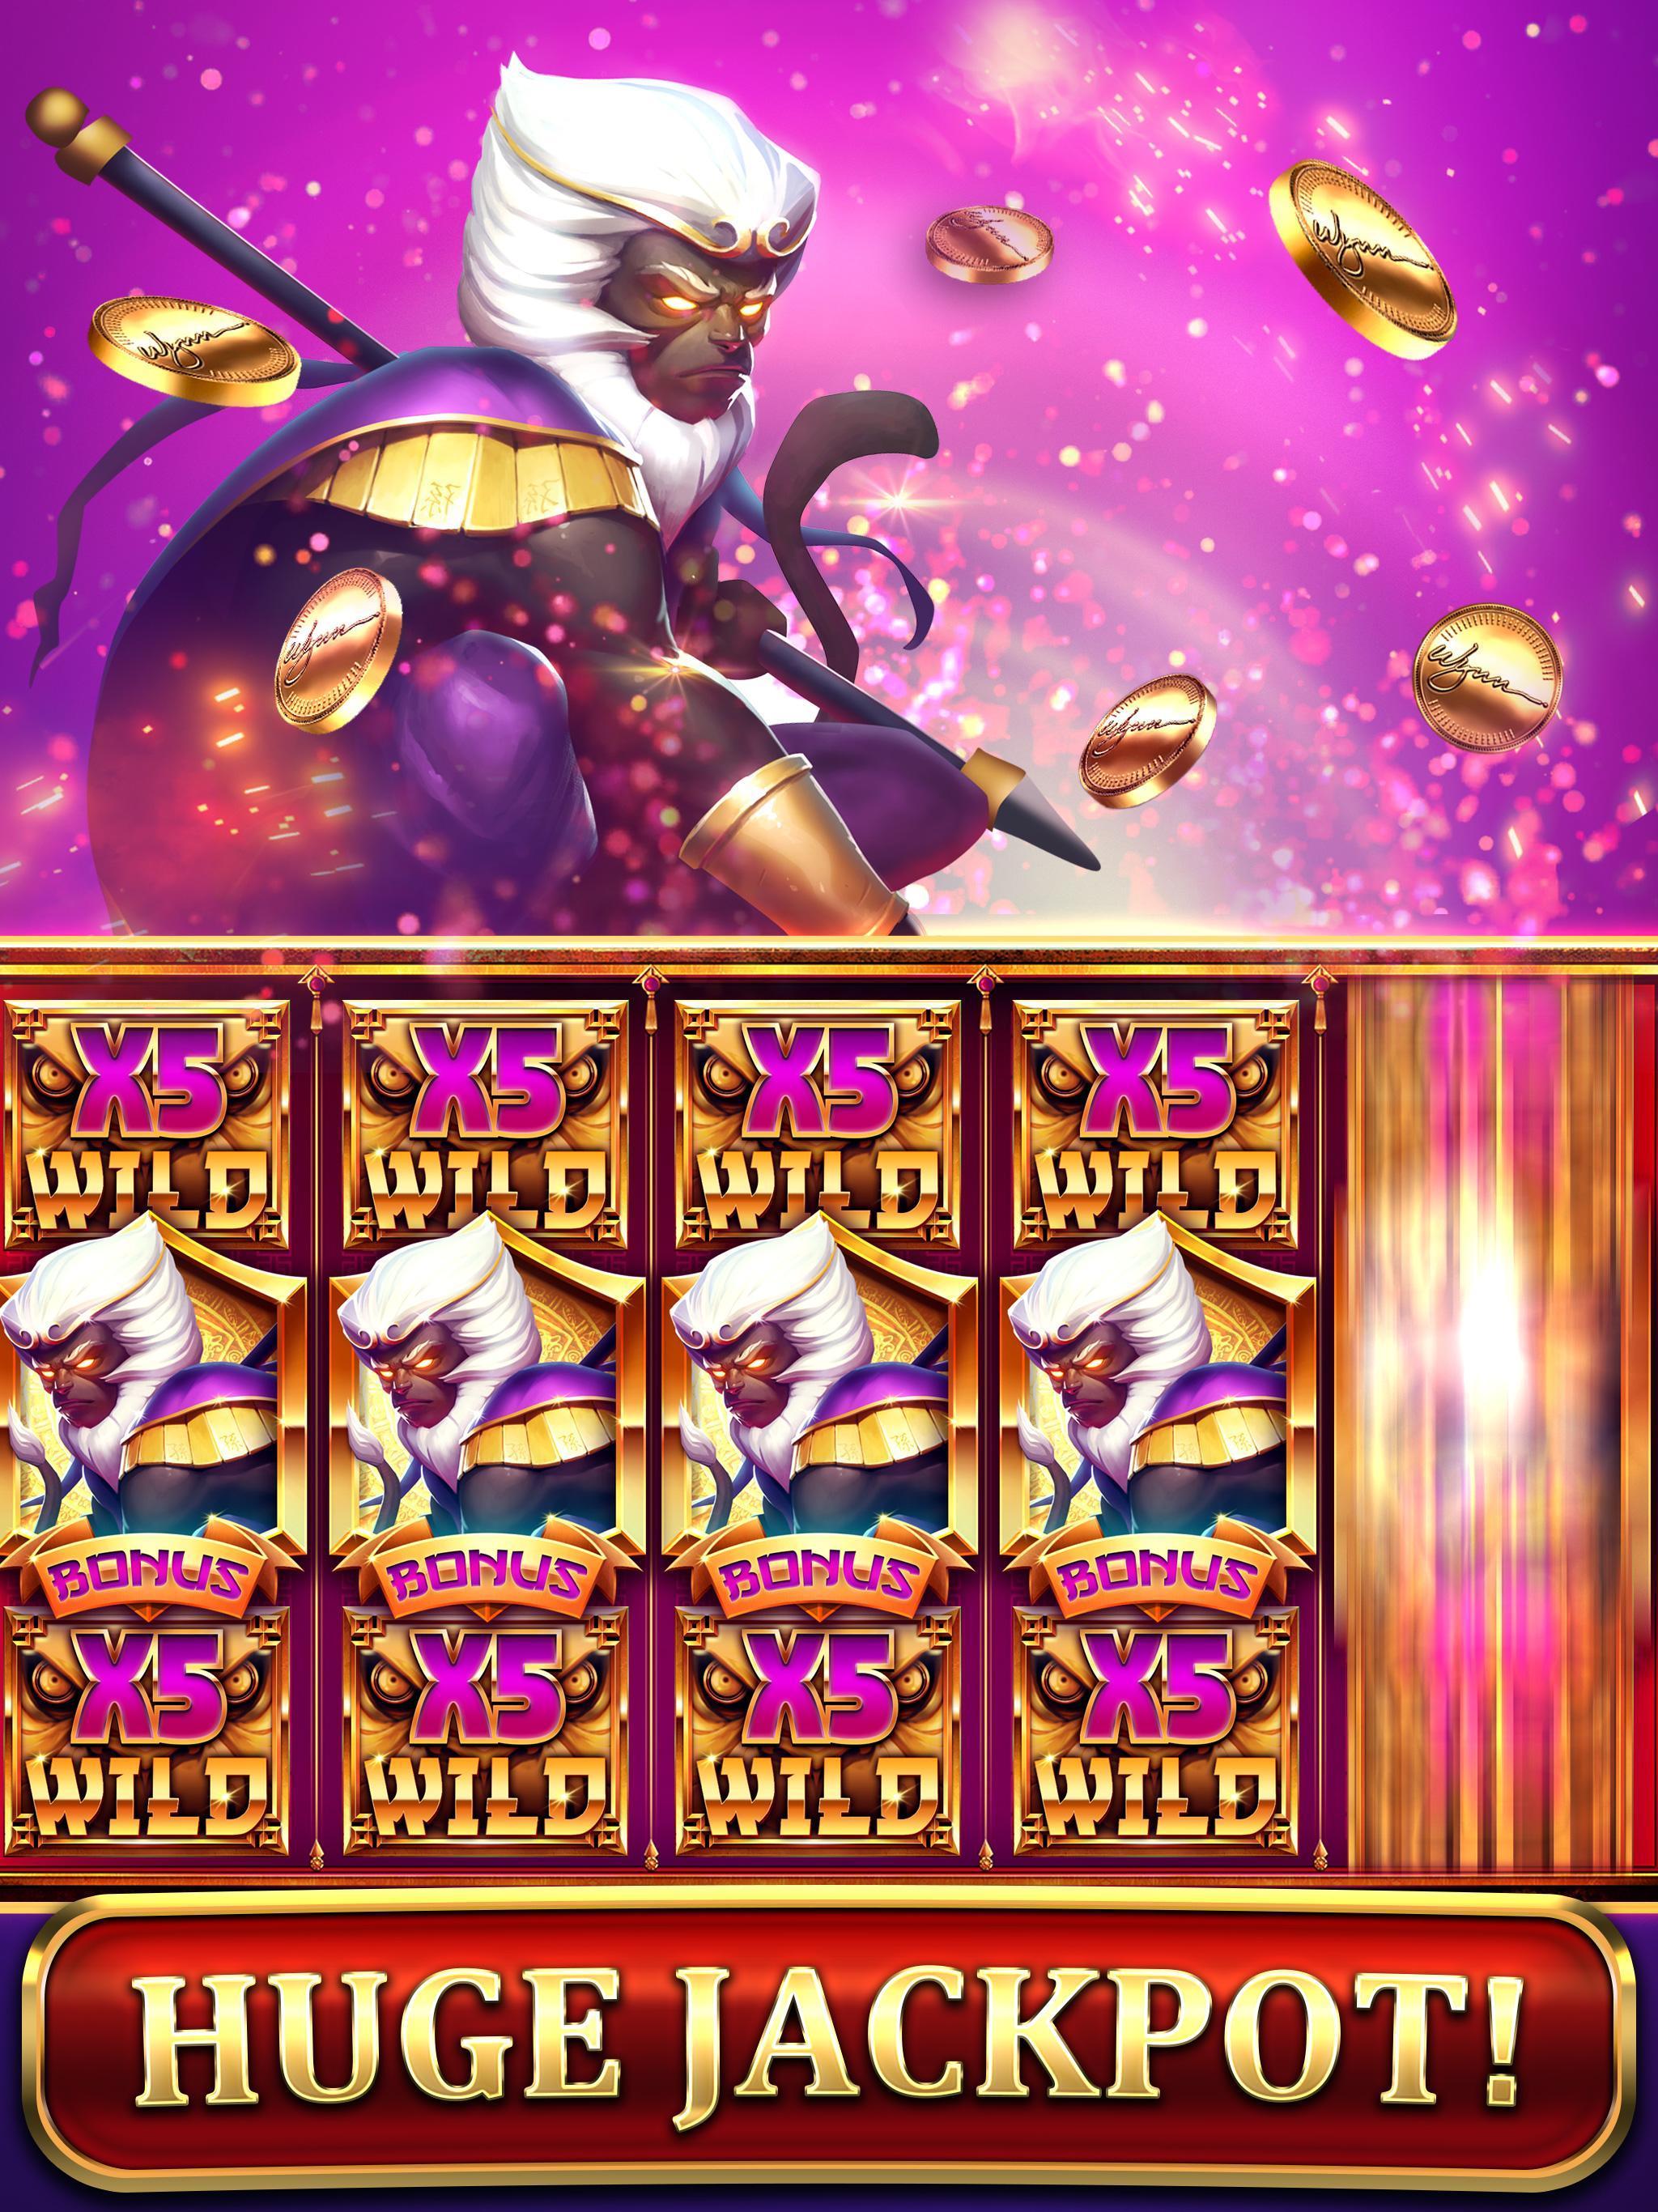 Blackjack casino world